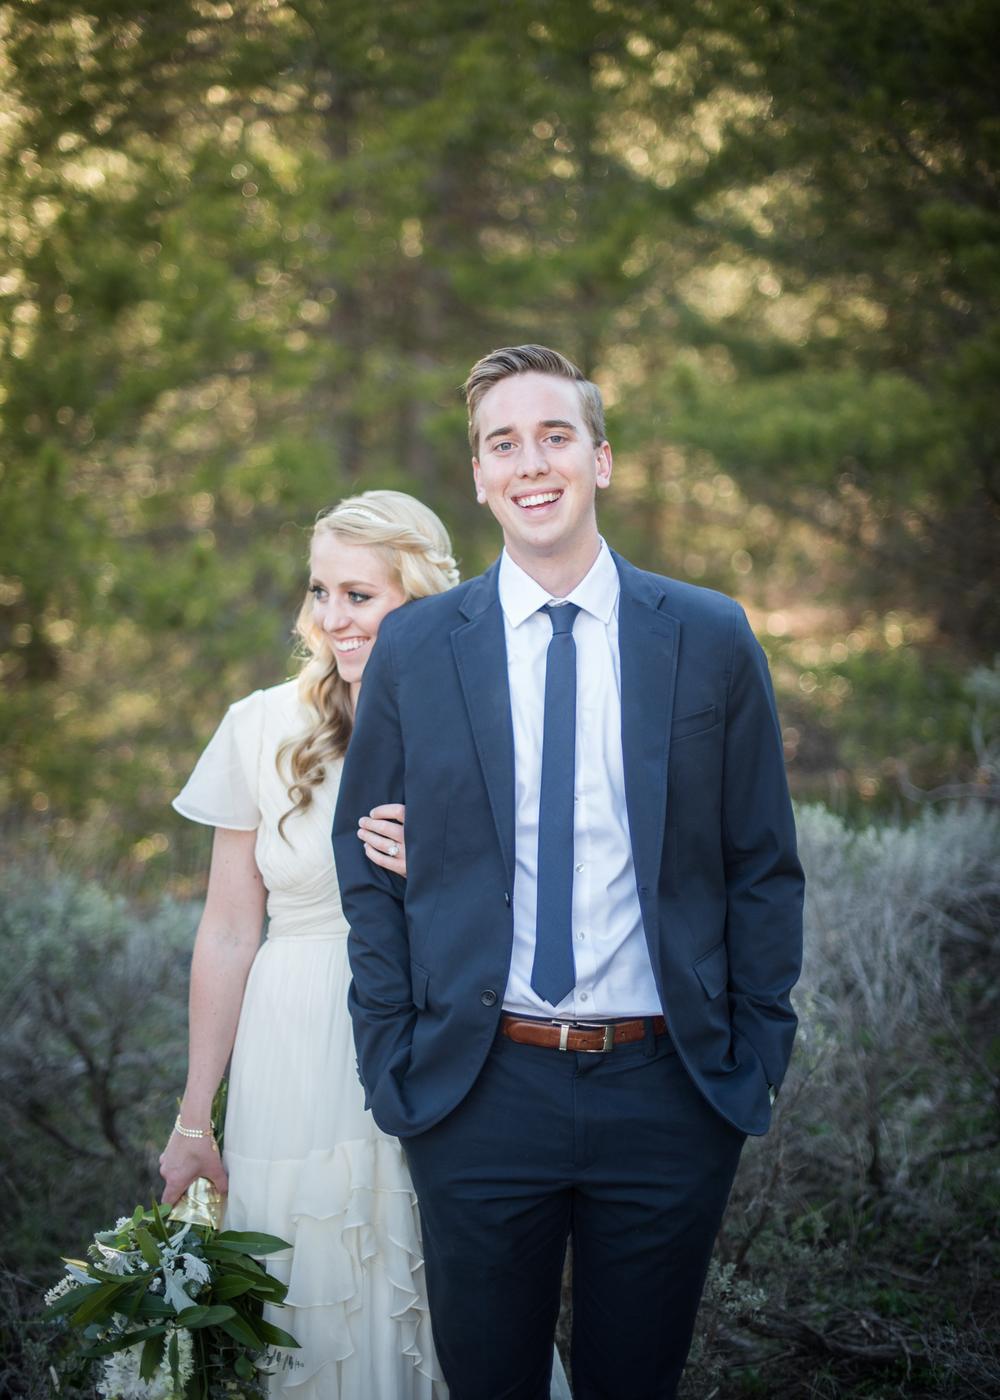 H&T_bridals_009.jpg